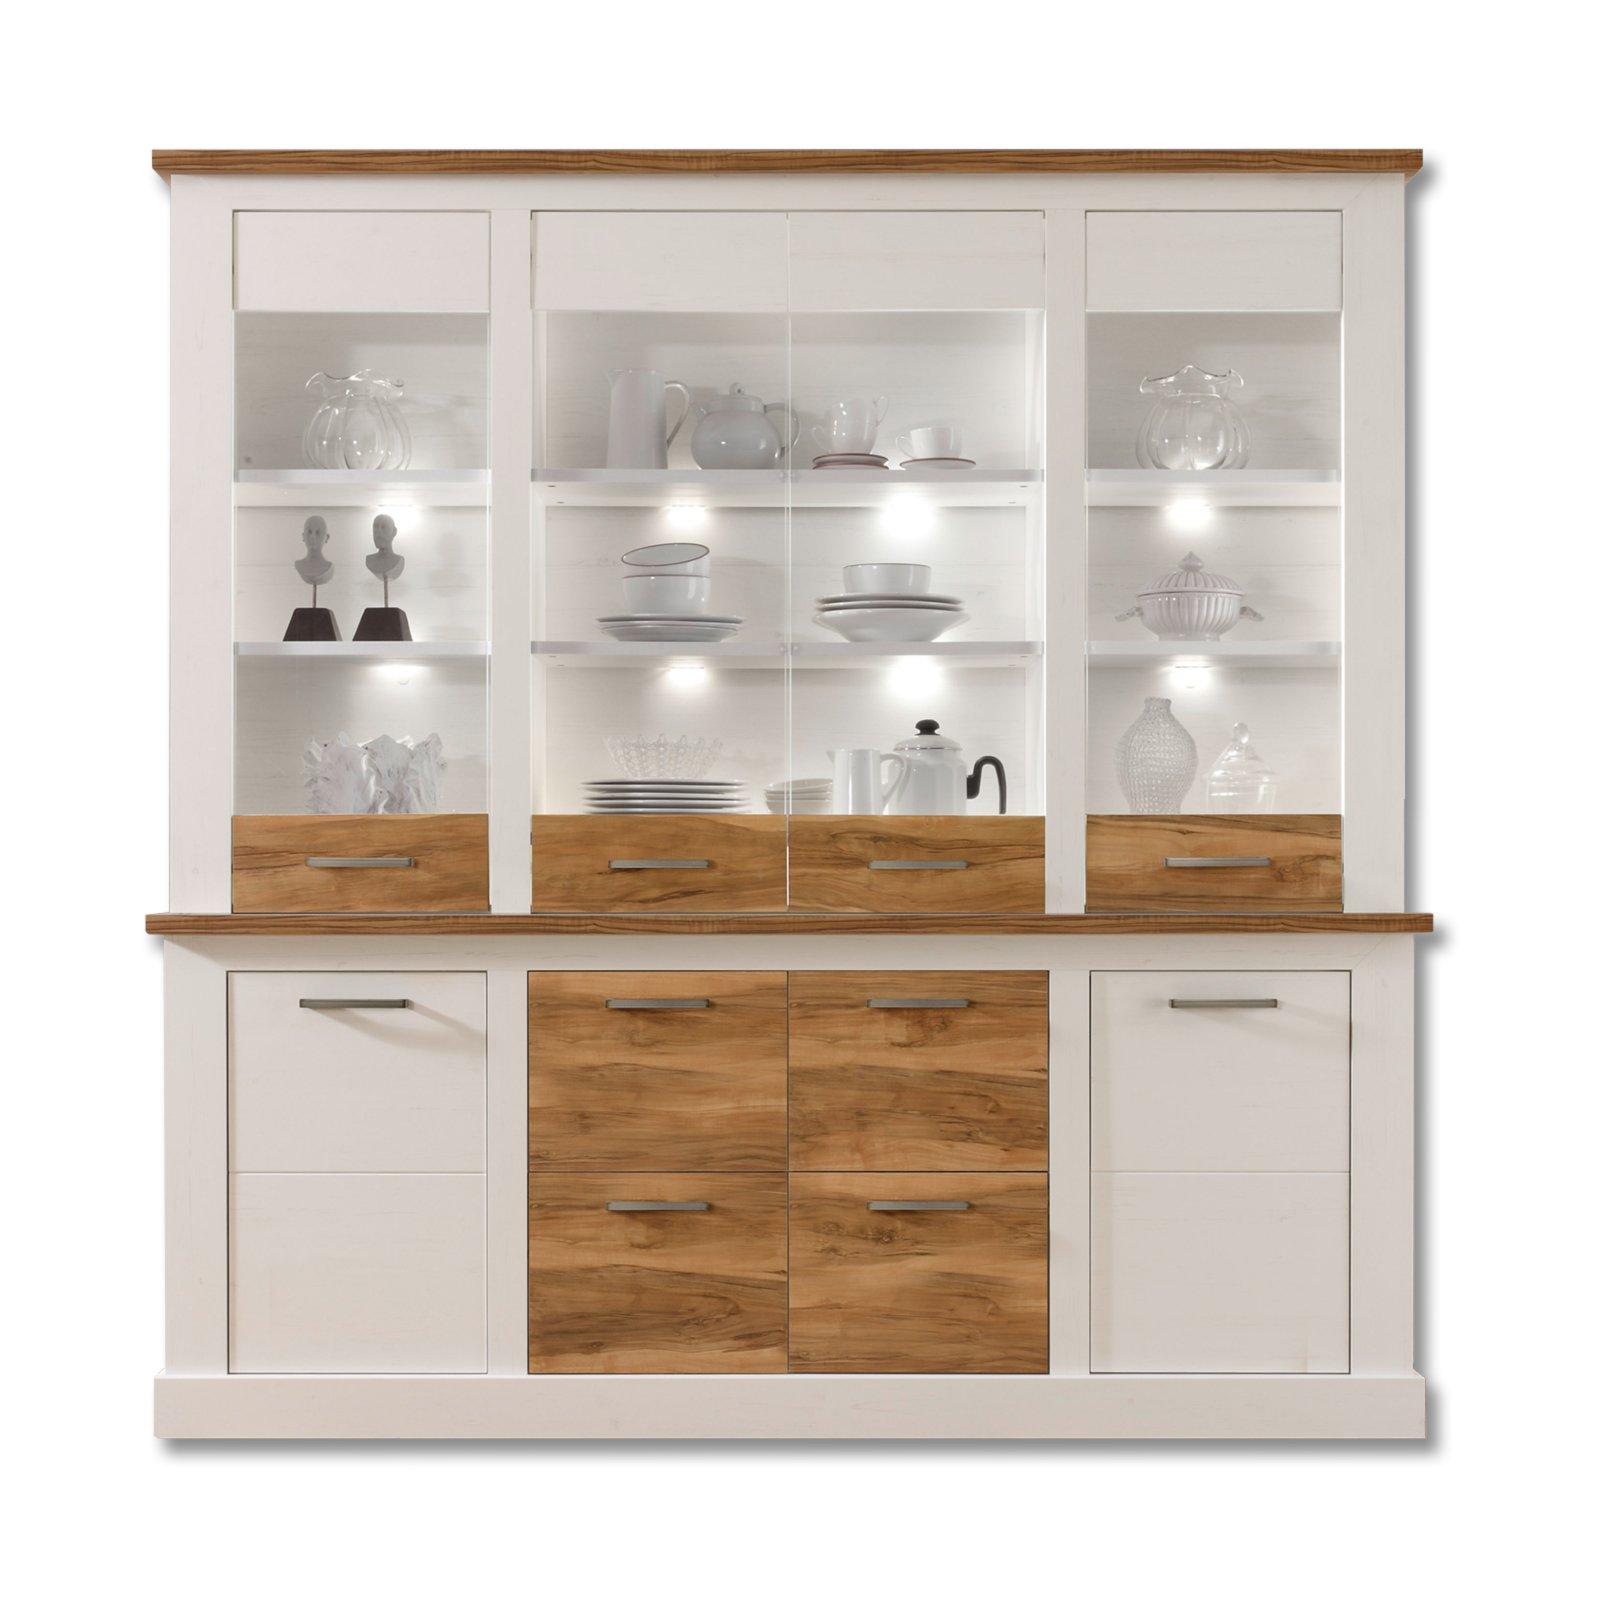 highboard toronto pinie hell satin nussbaum 210 cm breit kommoden sideboards m bel. Black Bedroom Furniture Sets. Home Design Ideas